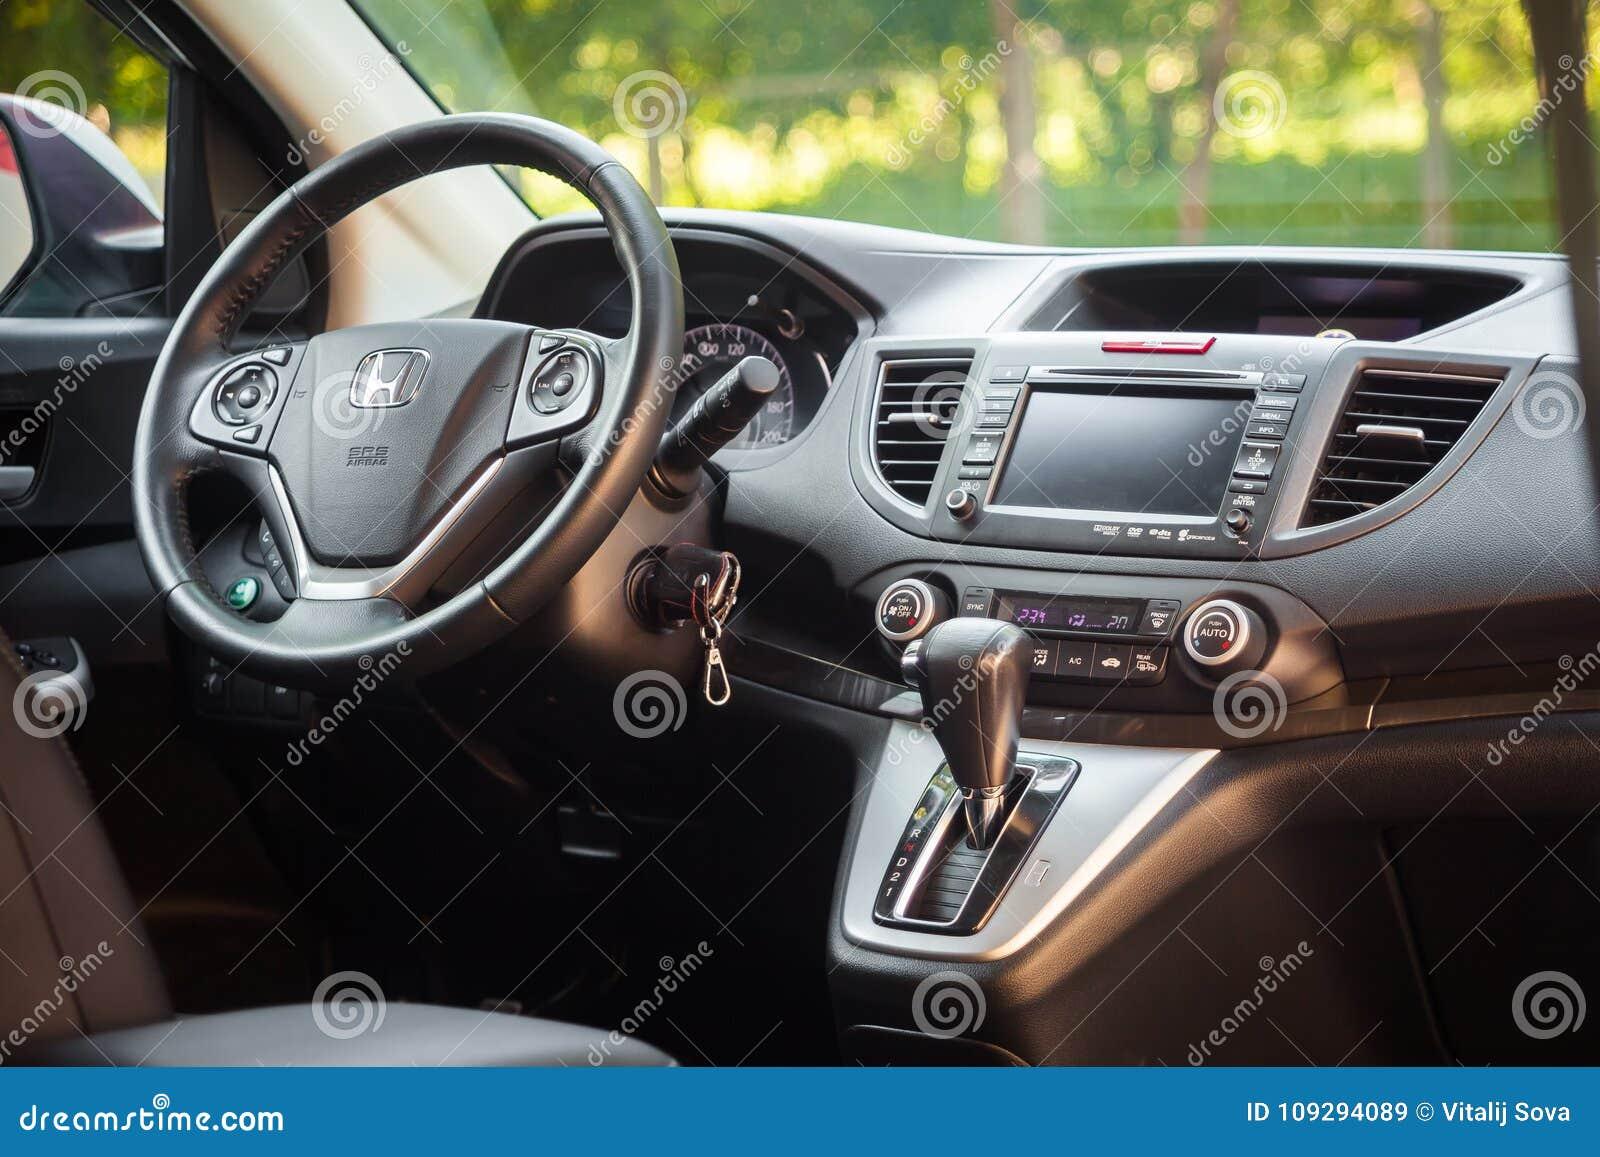 Crv 2017 Interior >> Interior Honda Crv Editorial Stock Image Image Of 2017